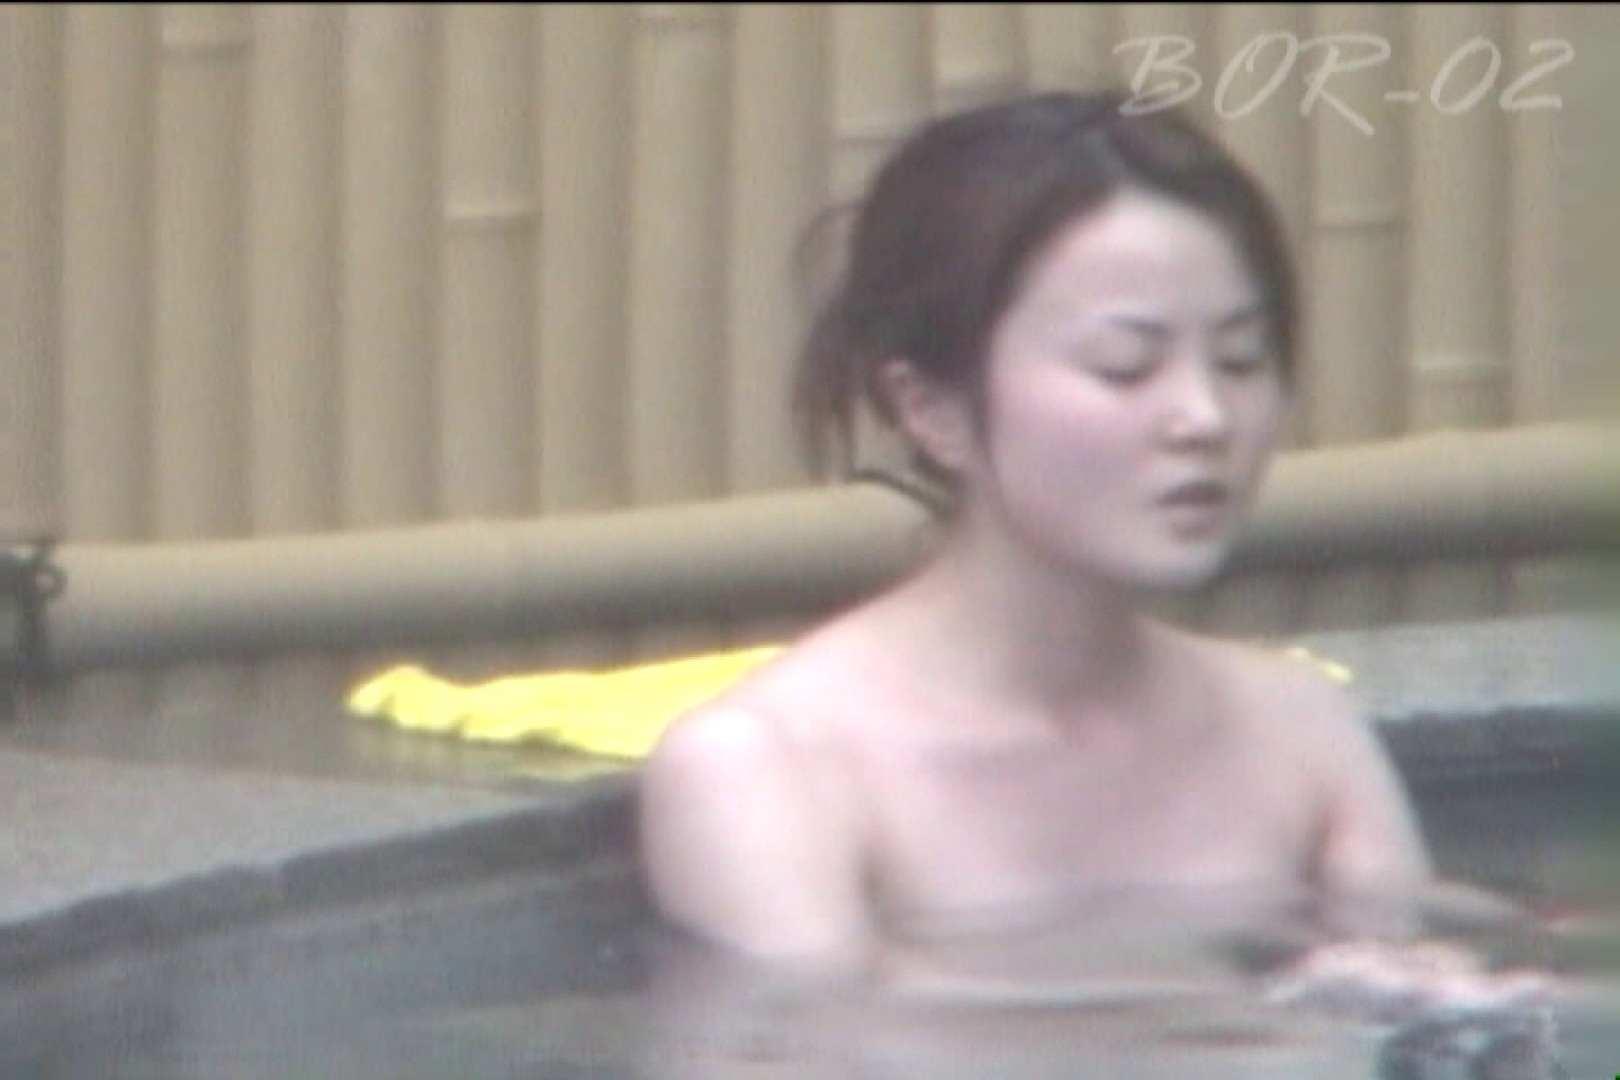 Aquaな露天風呂Vol.474 盗撮シリーズ | 露天風呂編  111PIX 89